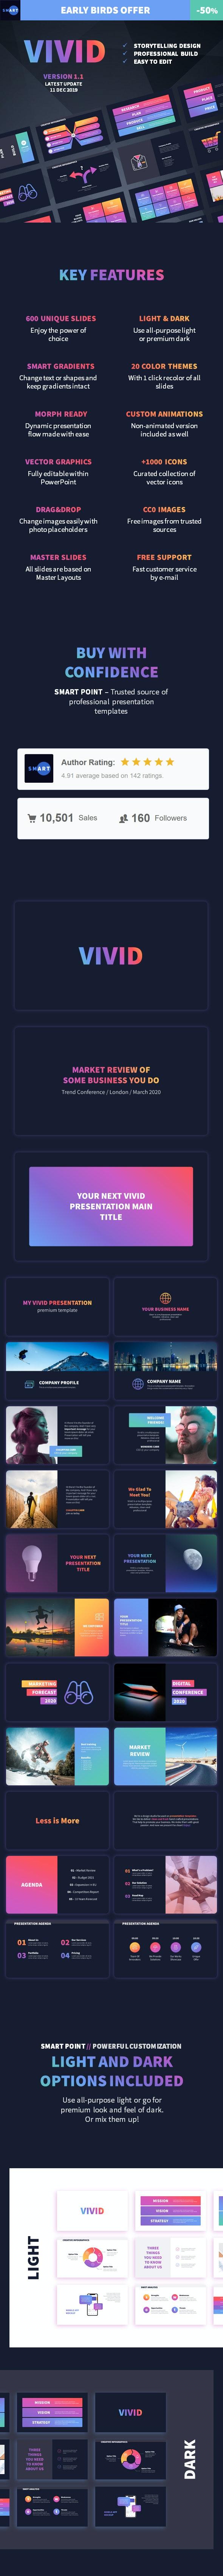 VIVID PowerPoint Presentation Template - Business PowerPoint Templates